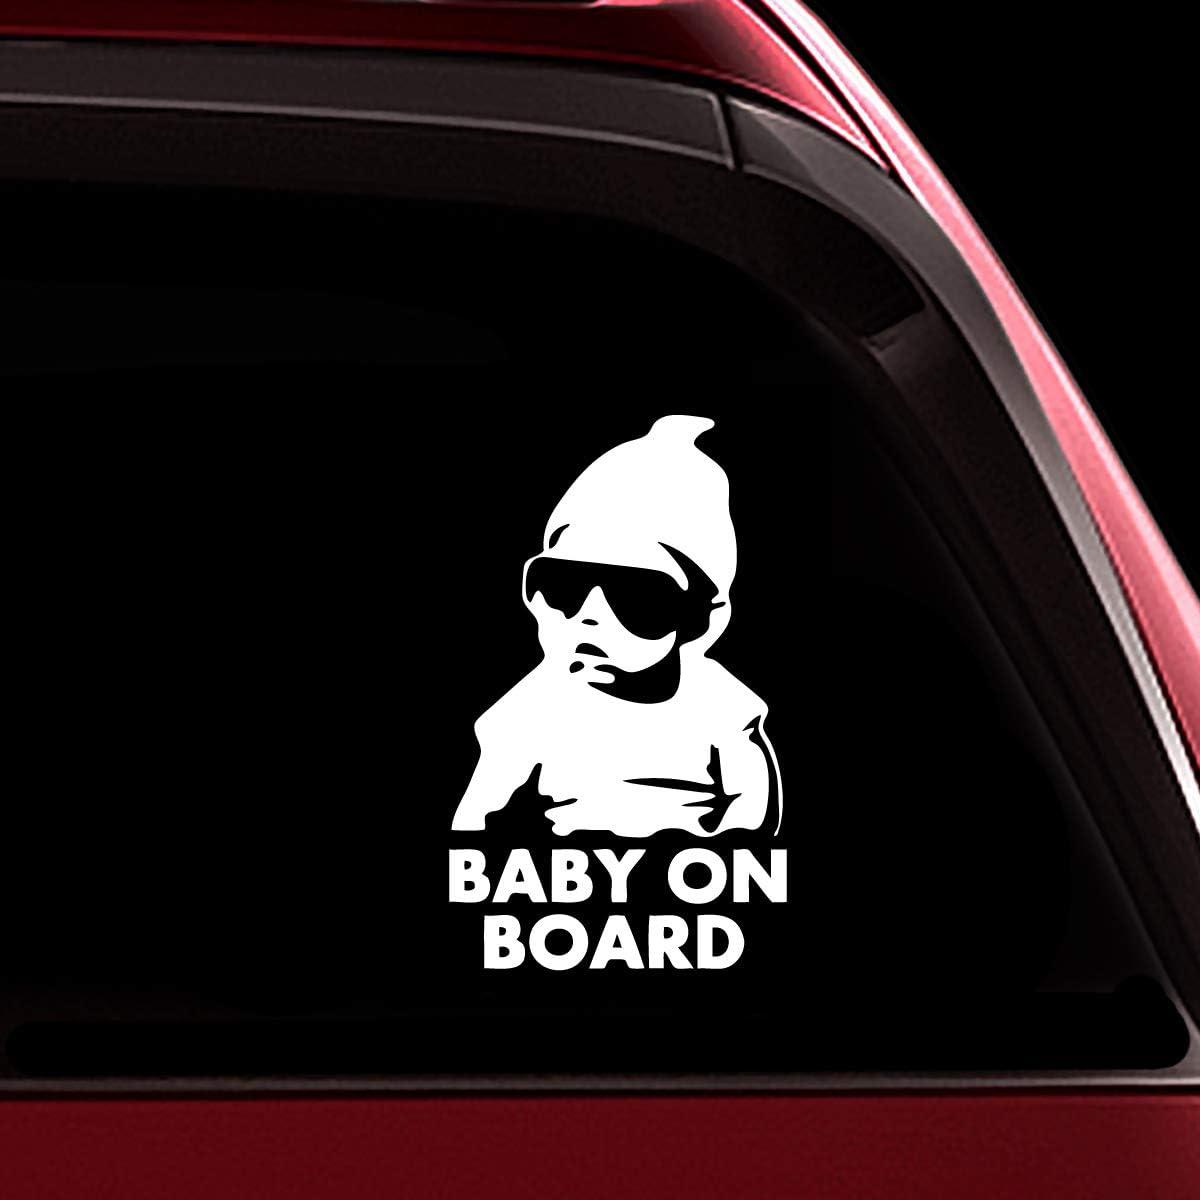 BABY ON BOARD Warning Sign Funny Car,Van,Bumper,Window Vinyl Decal Sticker